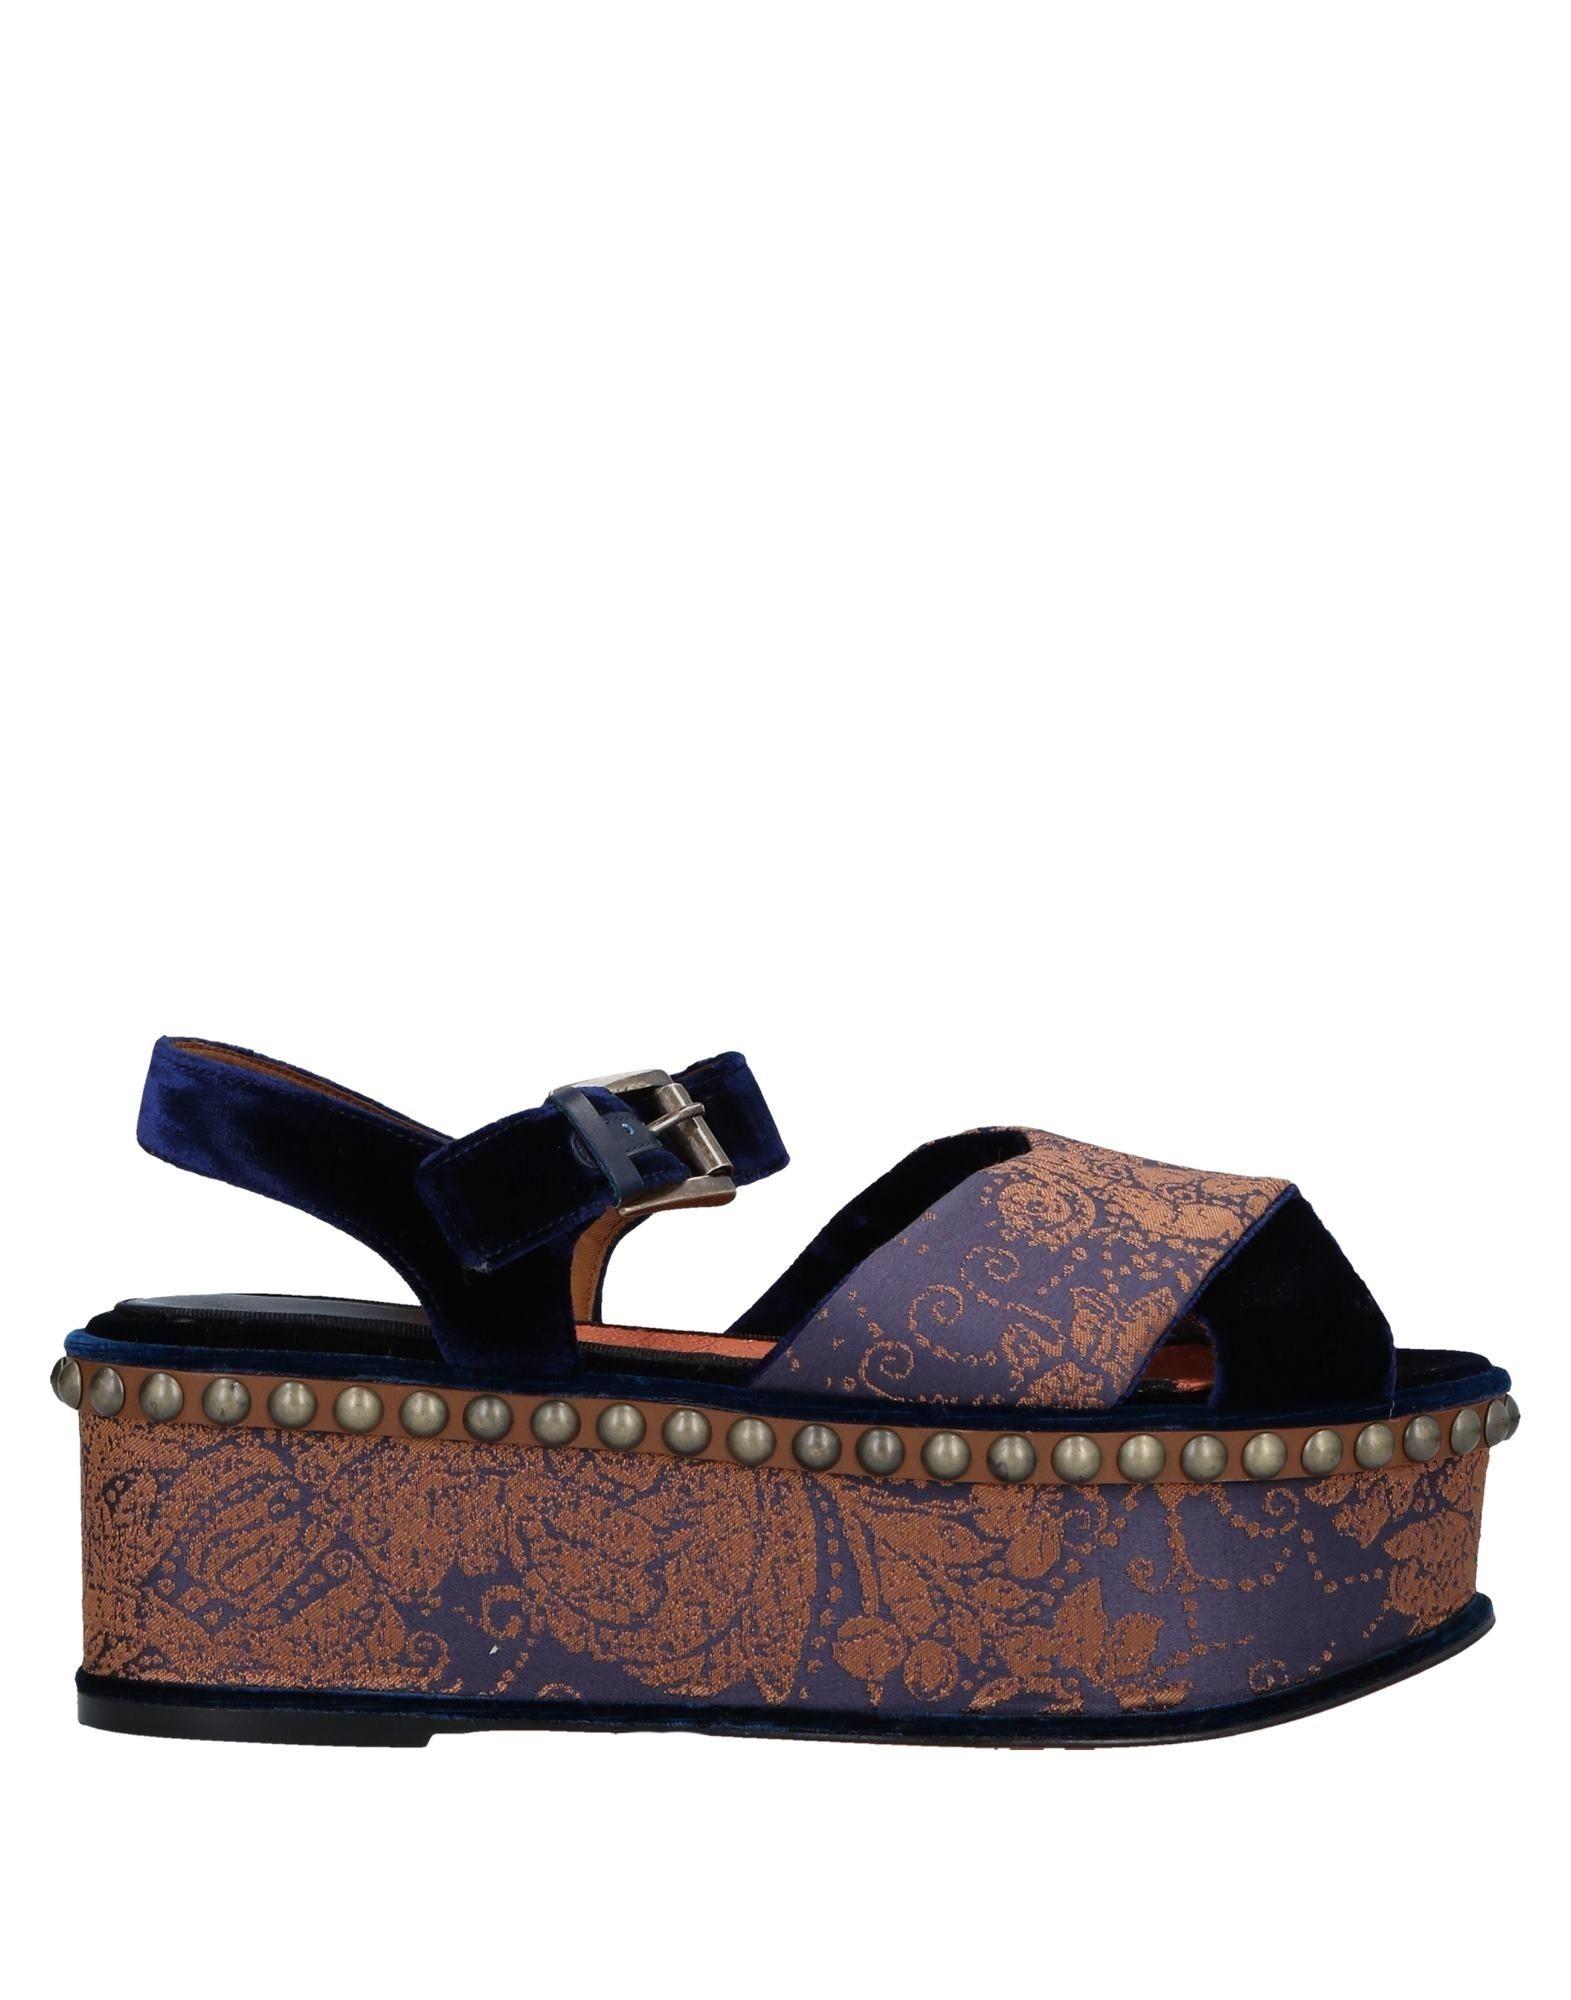 santoni sandales - le femmes santoni 11539734nj sandales en ligne le - royaume - uni - 739e0d